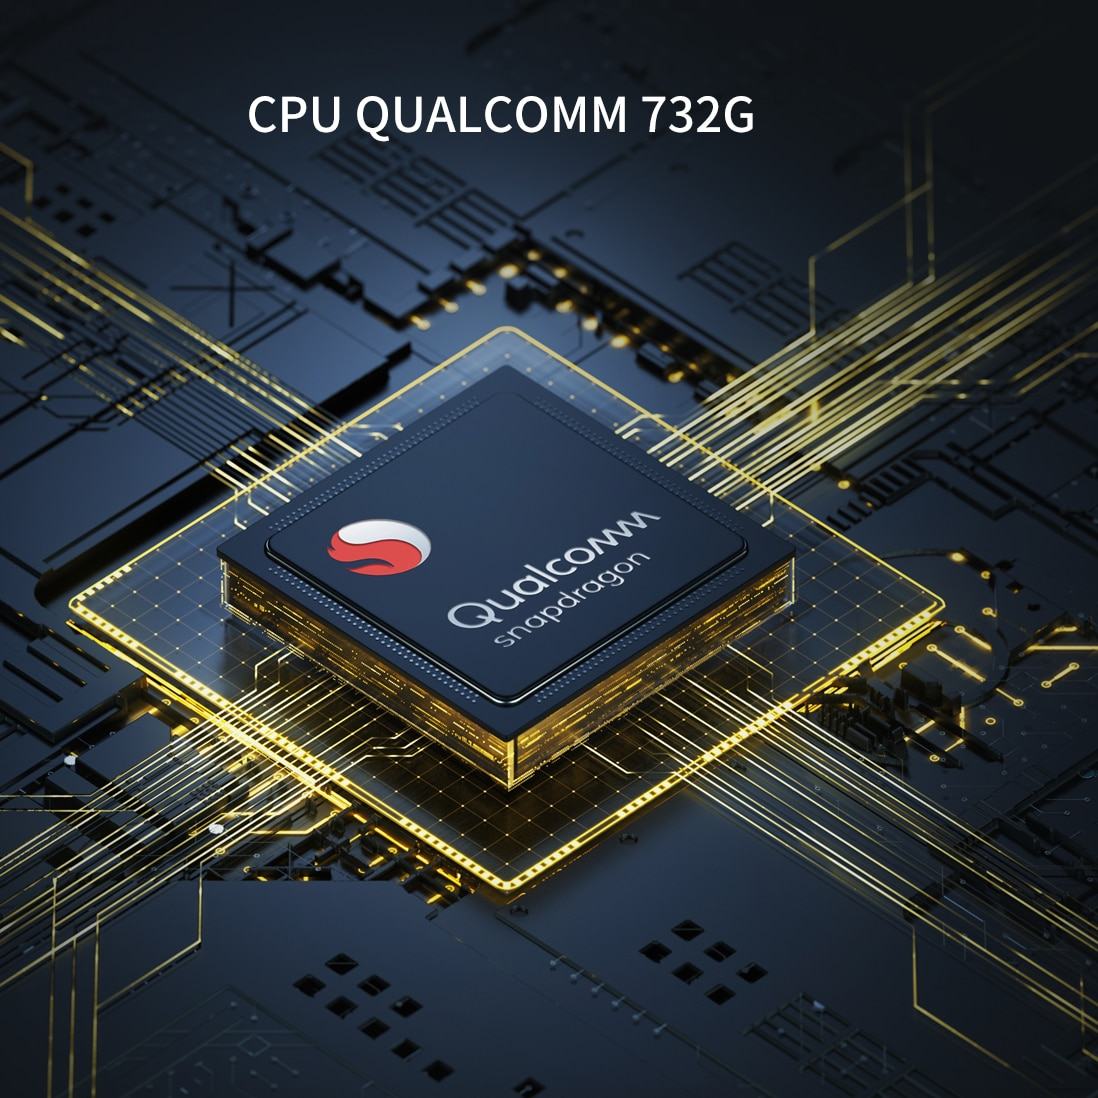 Original Global Version Xiaomi Redmi Note 10 Pro Smartphone Snapdragon 732G 108MP Camera 5020mAh Battery 120HZ AMOLED Screen enlarge